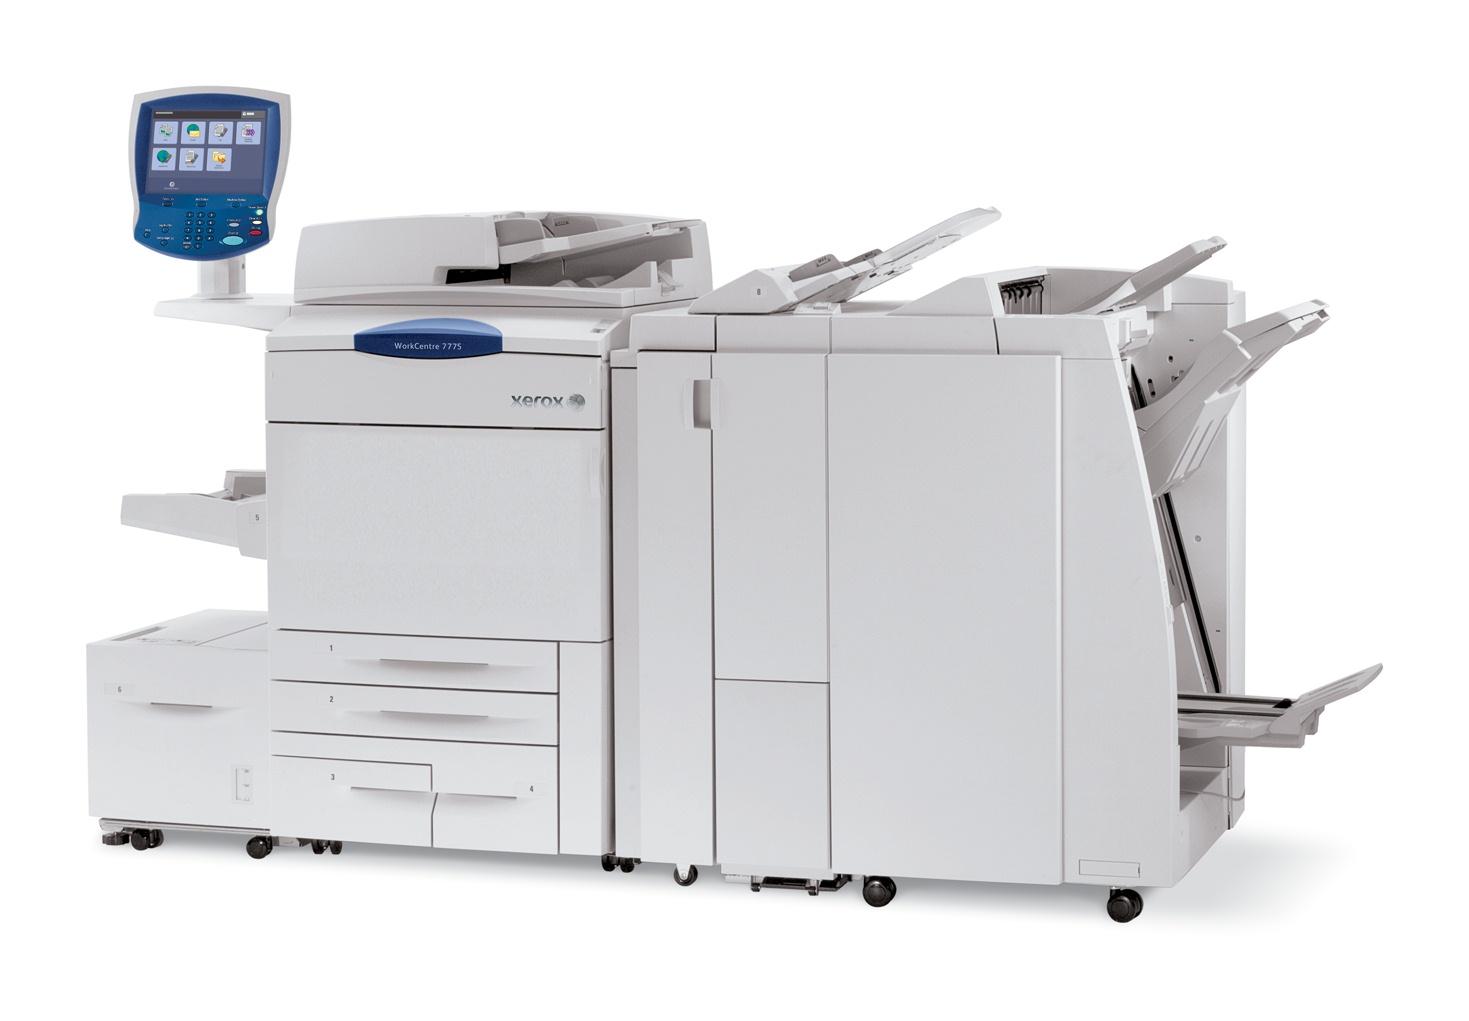 Xerox WorkCentre 7755 Toner Cartridges